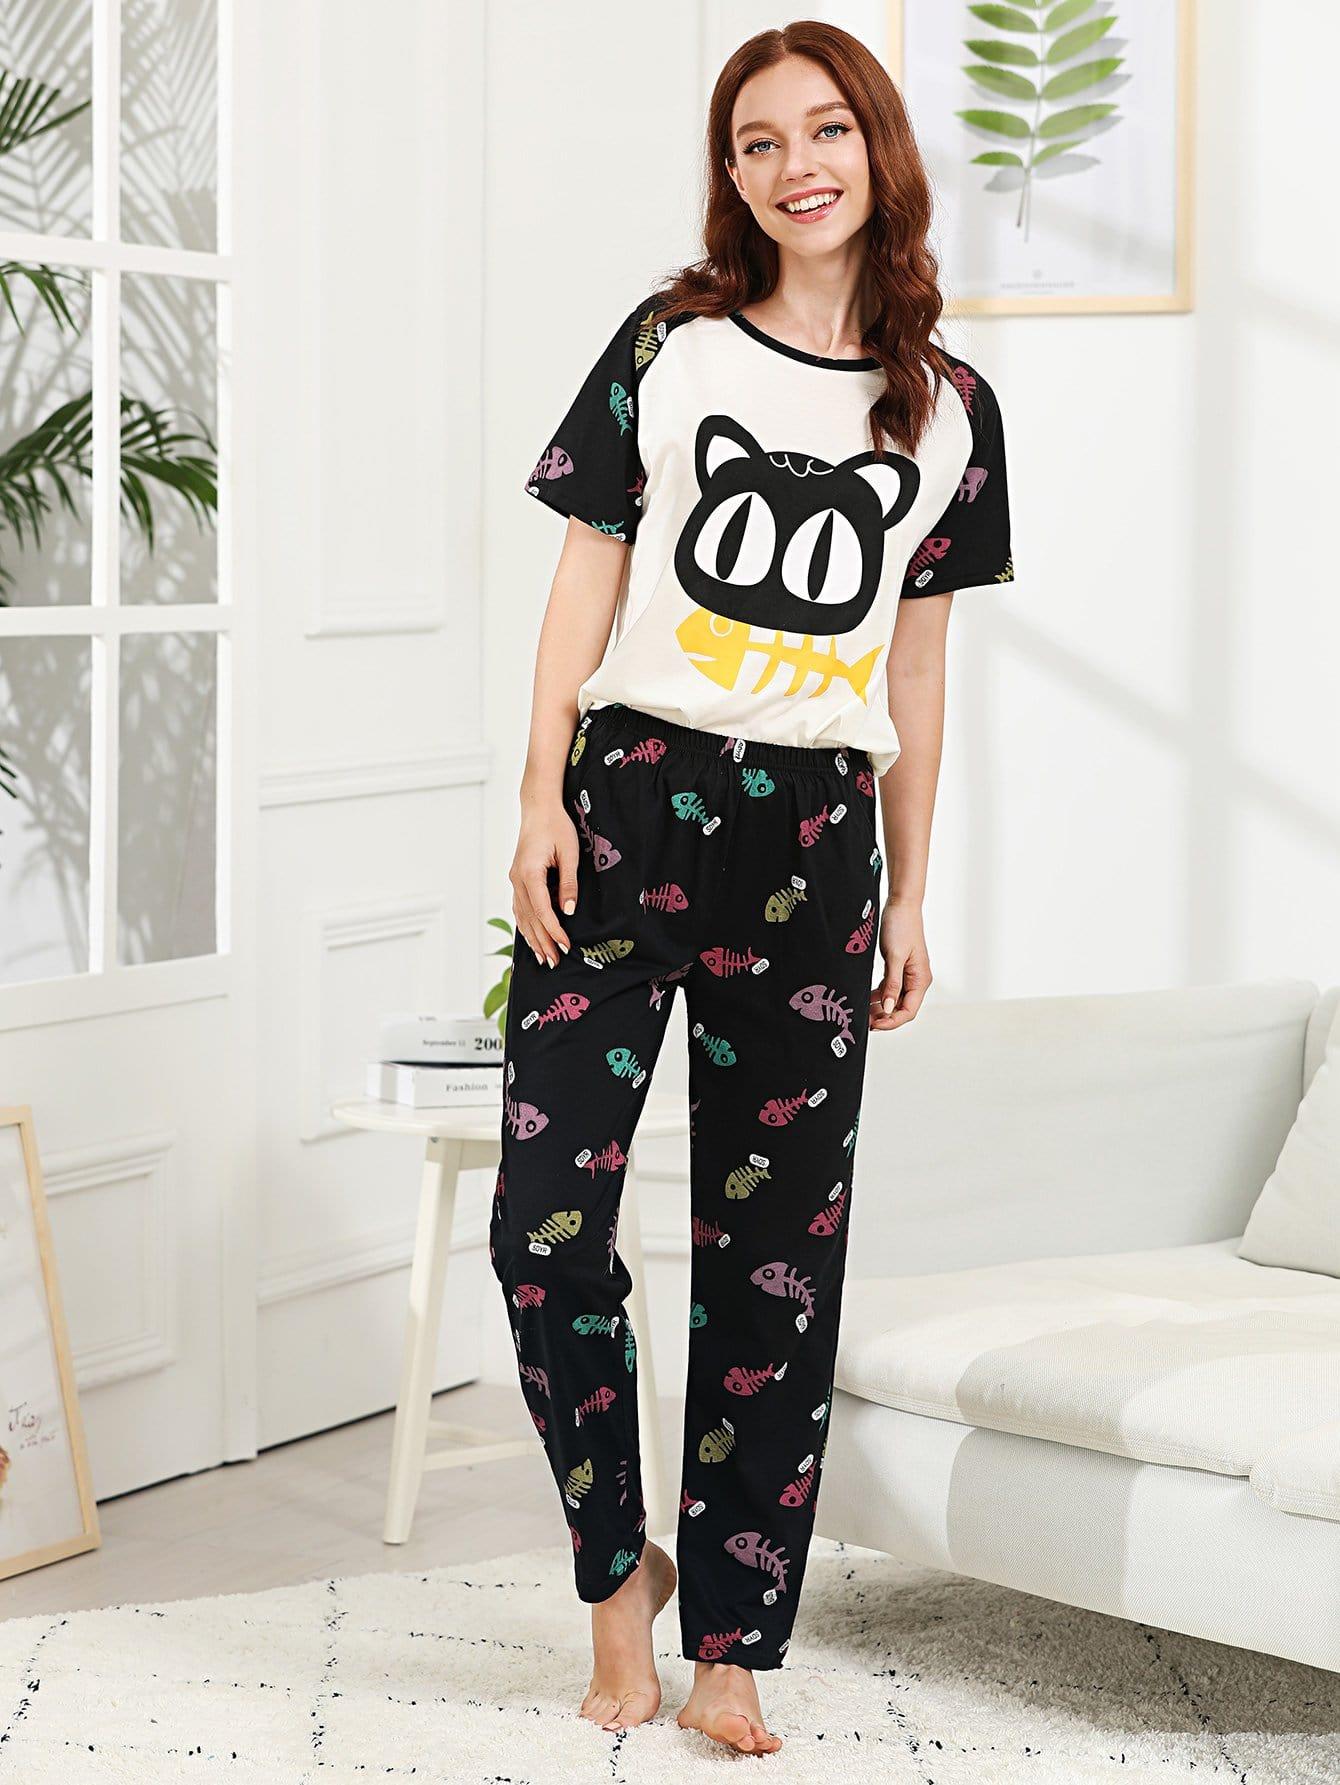 Cartoon Print Pajama Set all over cartoon print pajama set